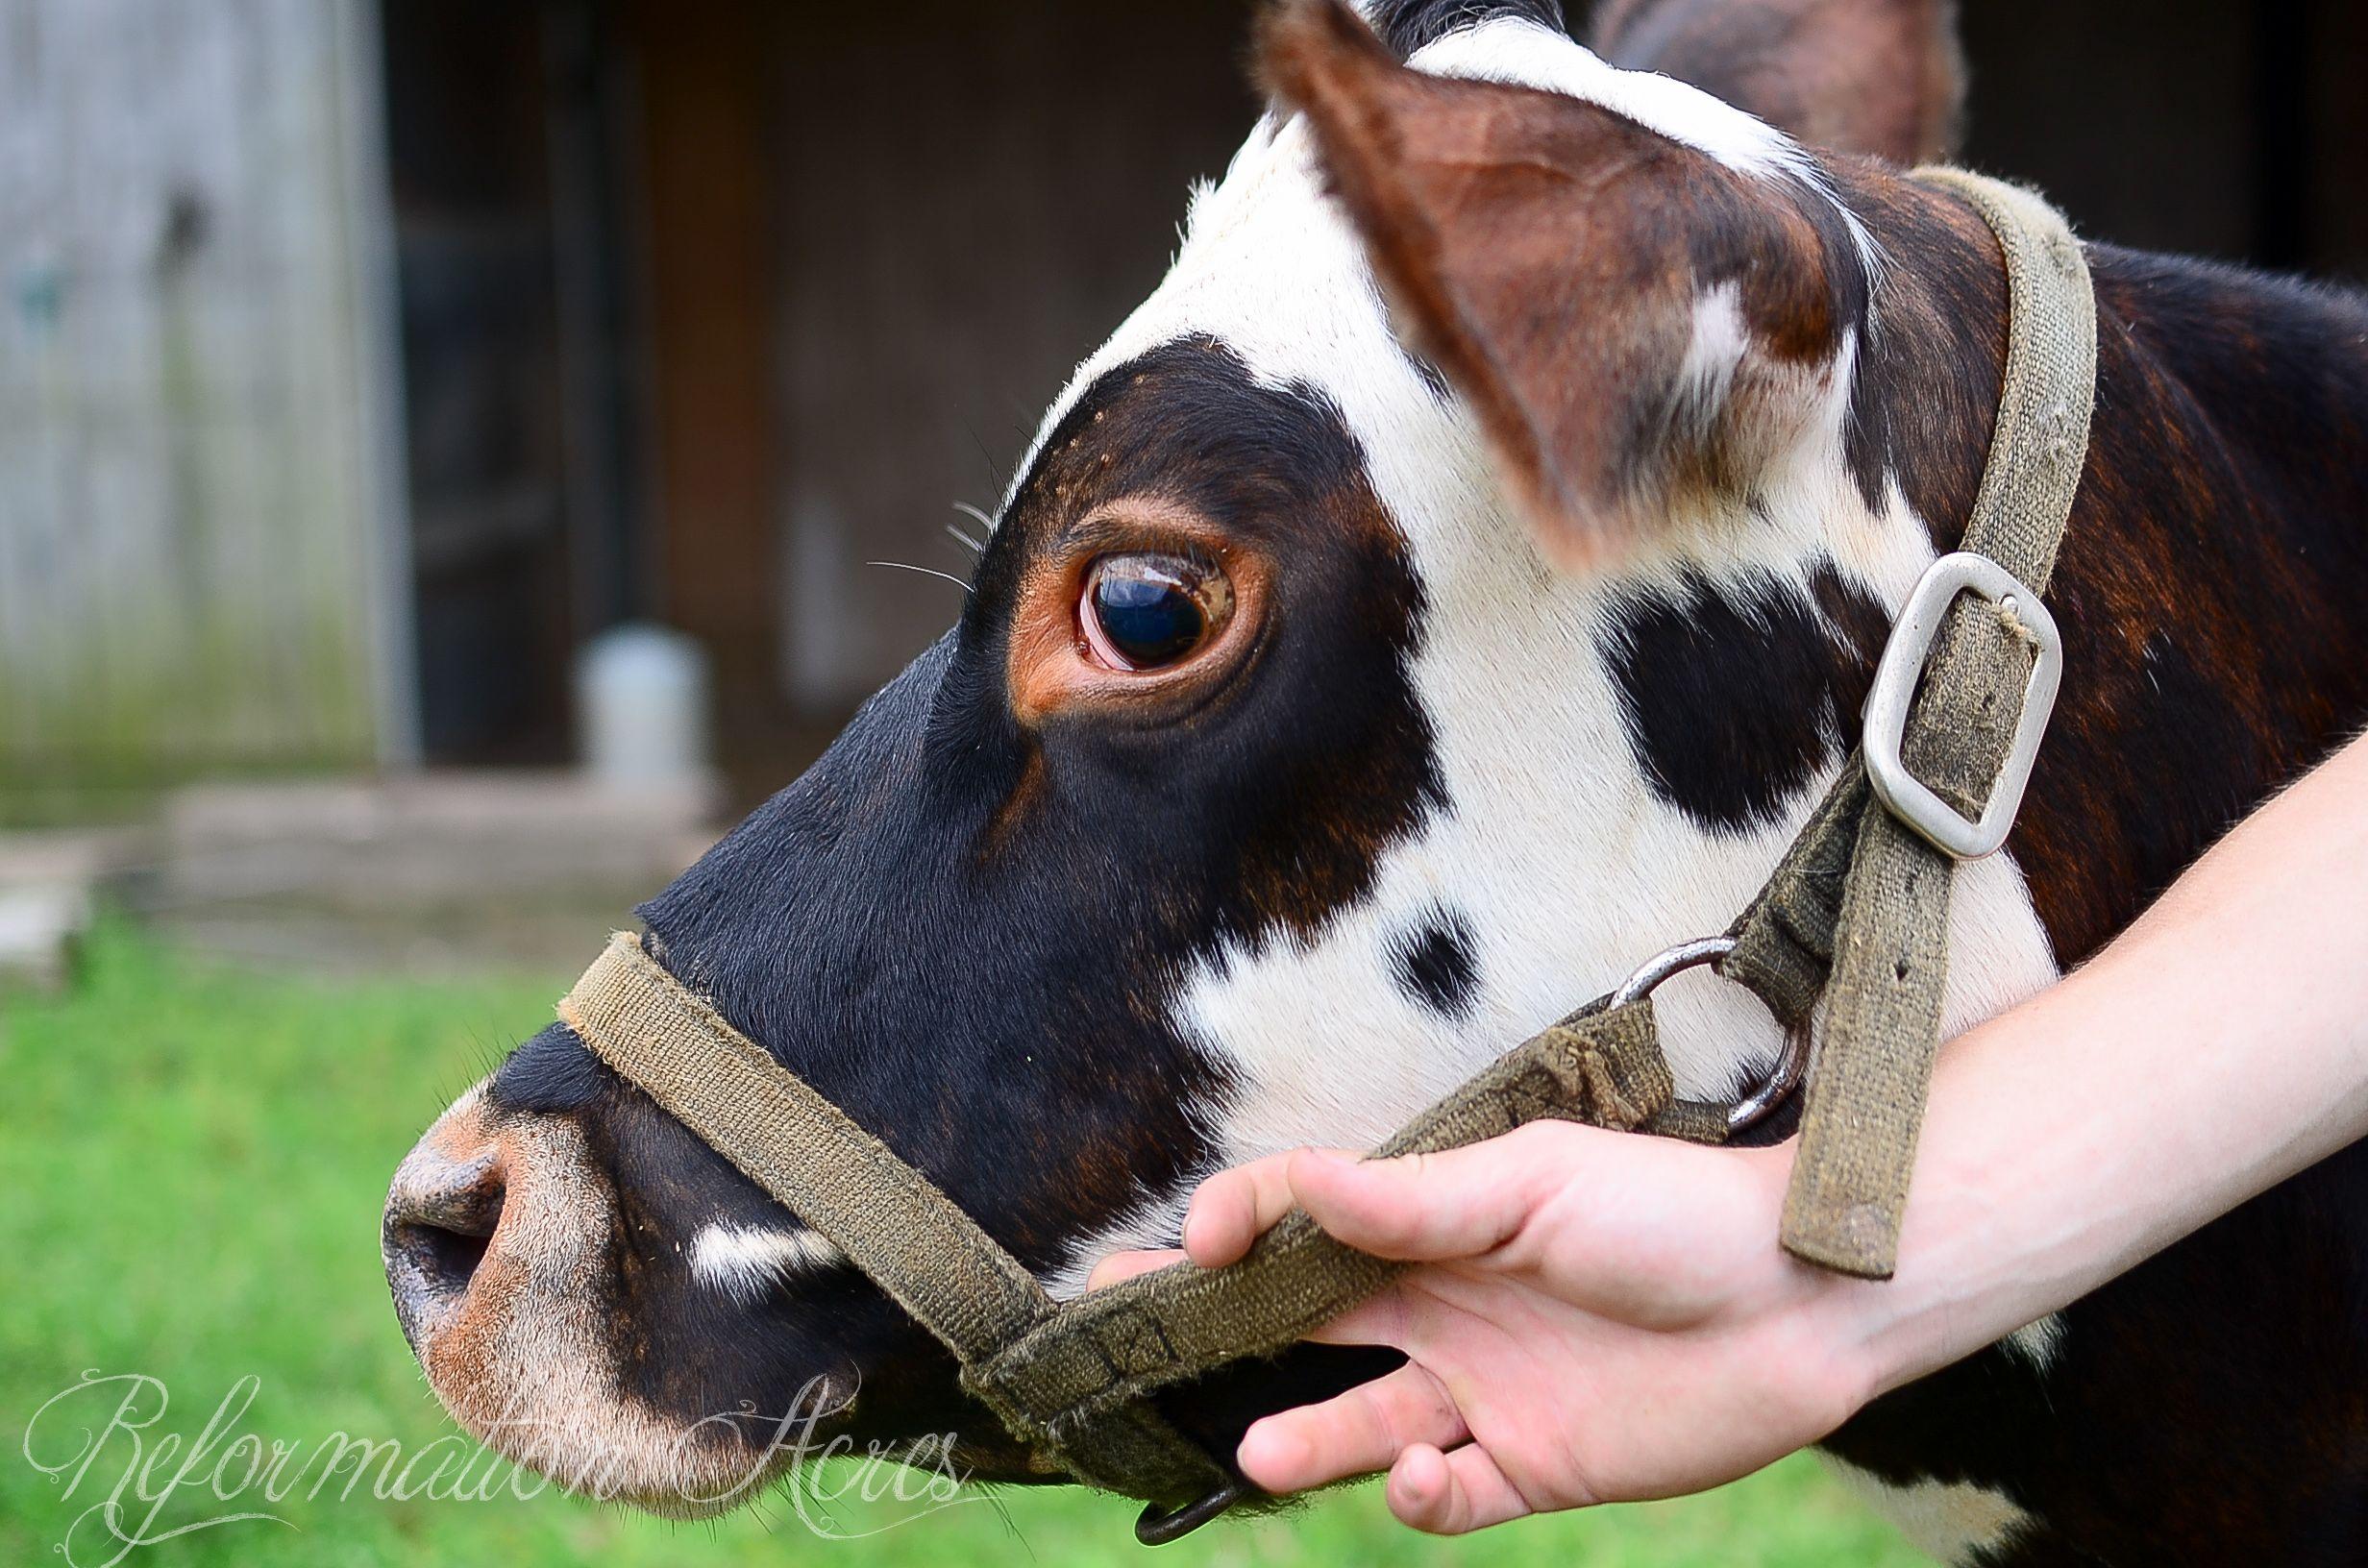 Family Milk Cow 101 Cow Barnyard Animals Baby Cows